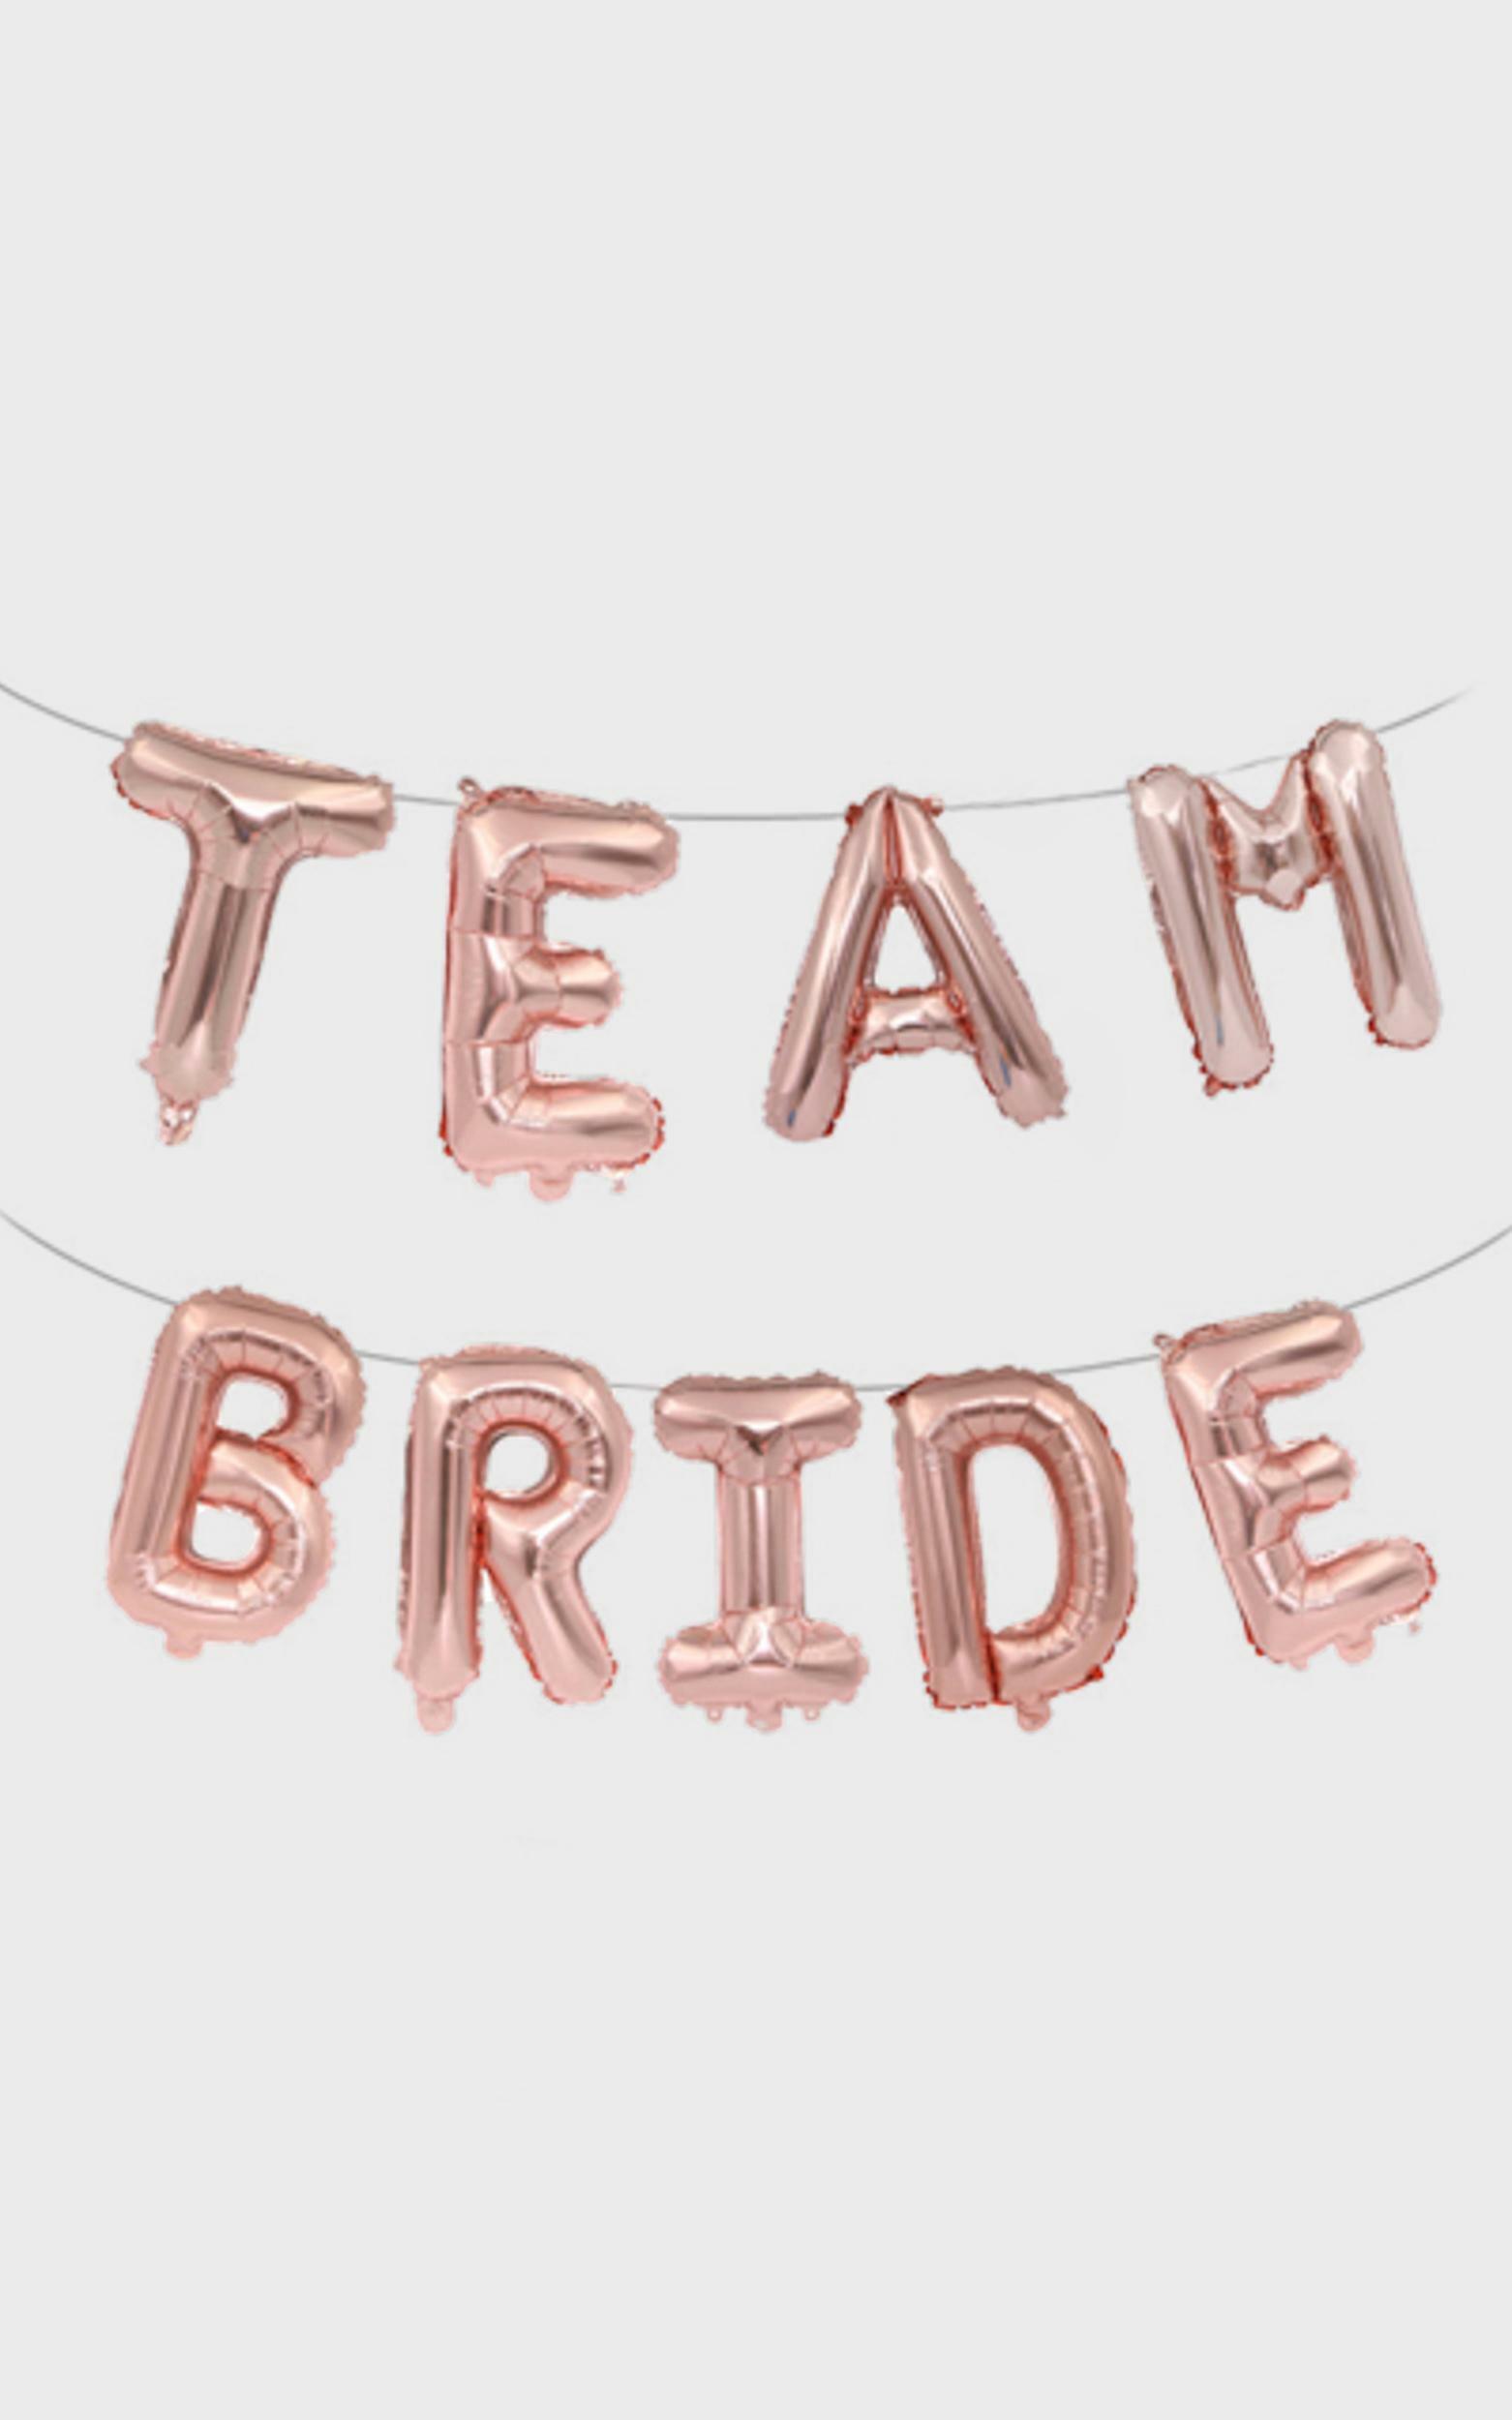 Team Bride Balloon Banner in Pink, PNK1, hi-res image number null